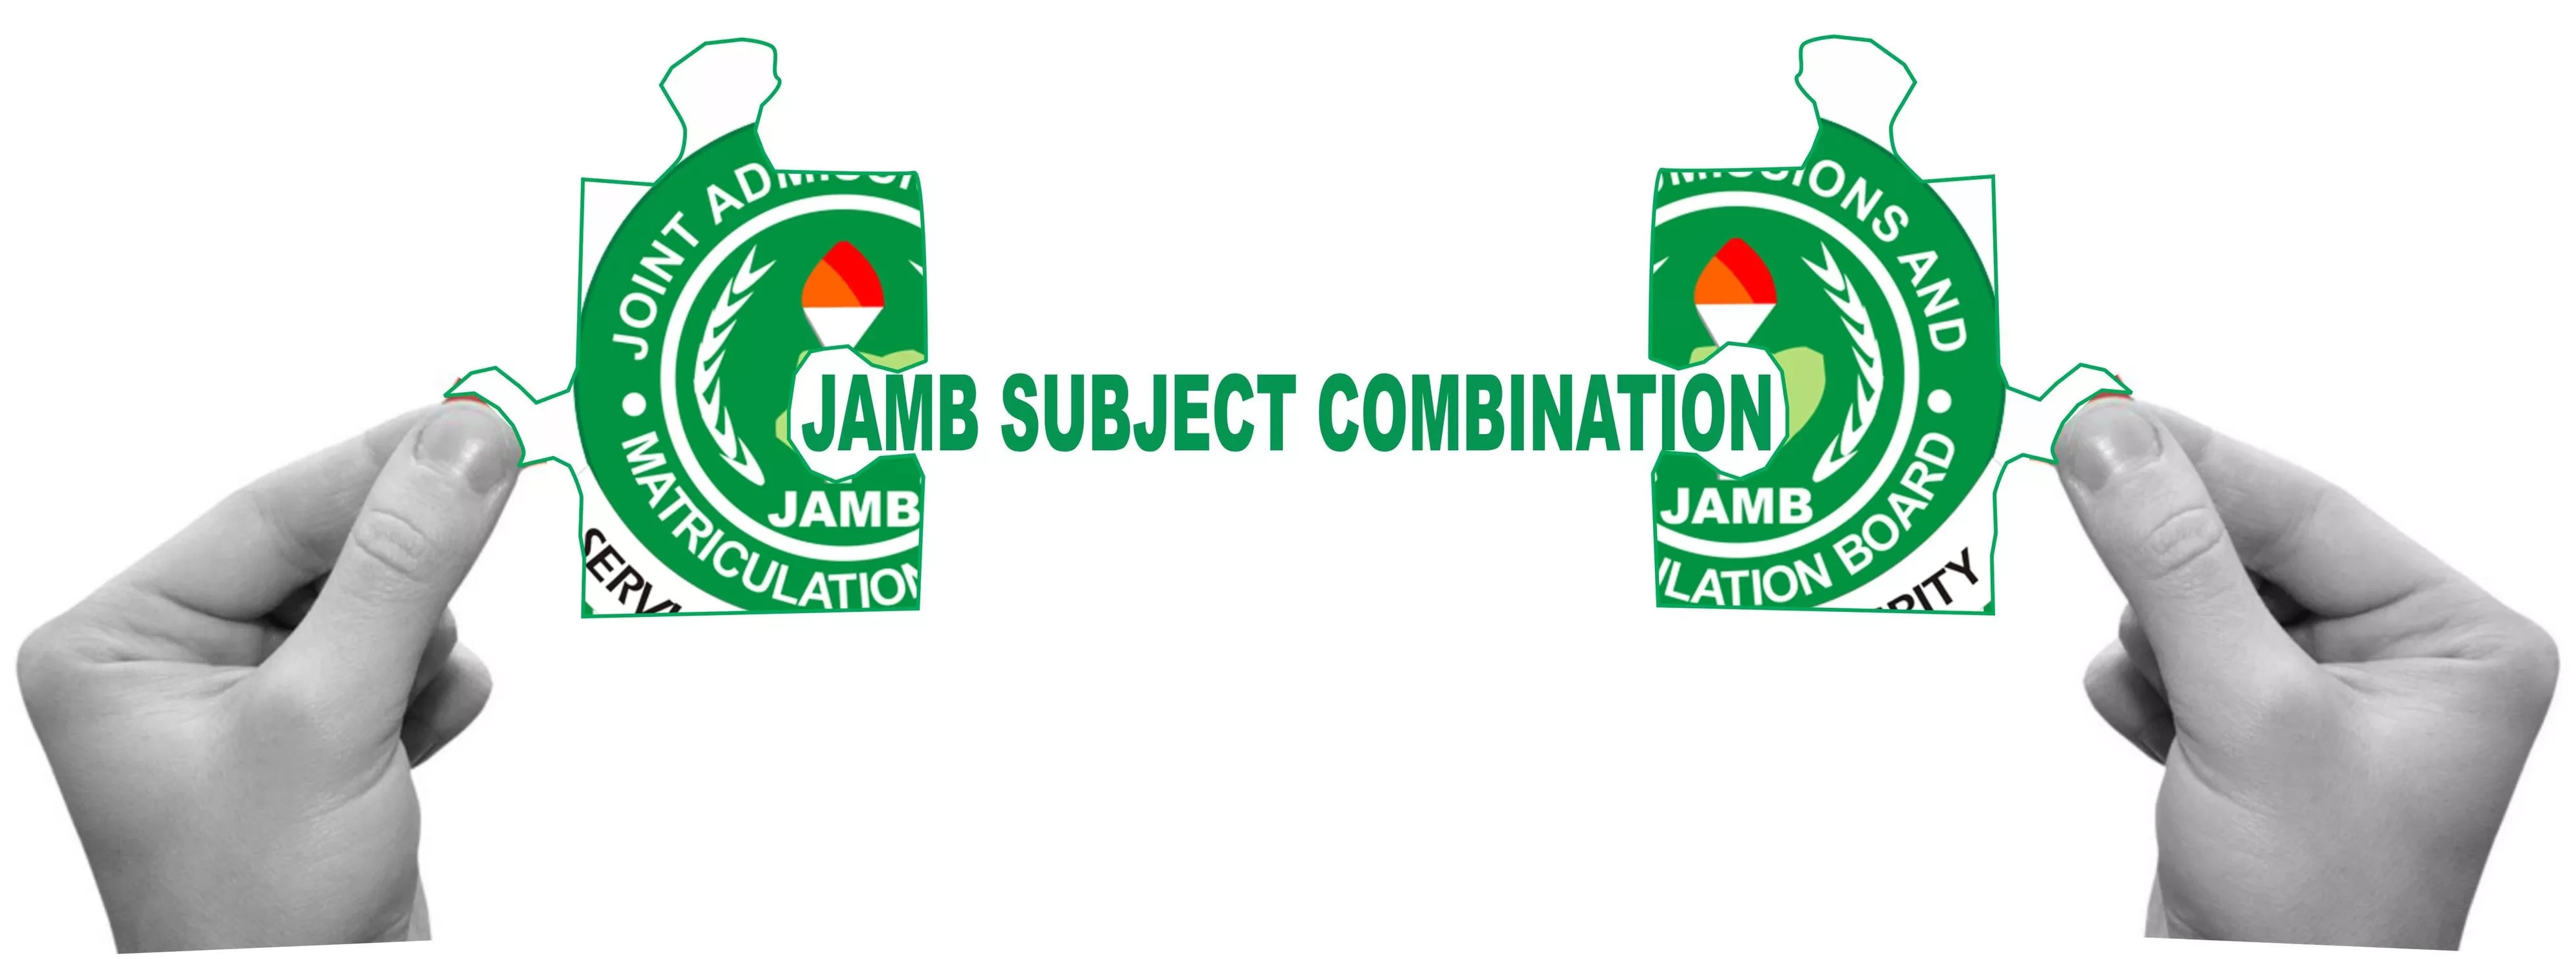 jamb subject combination